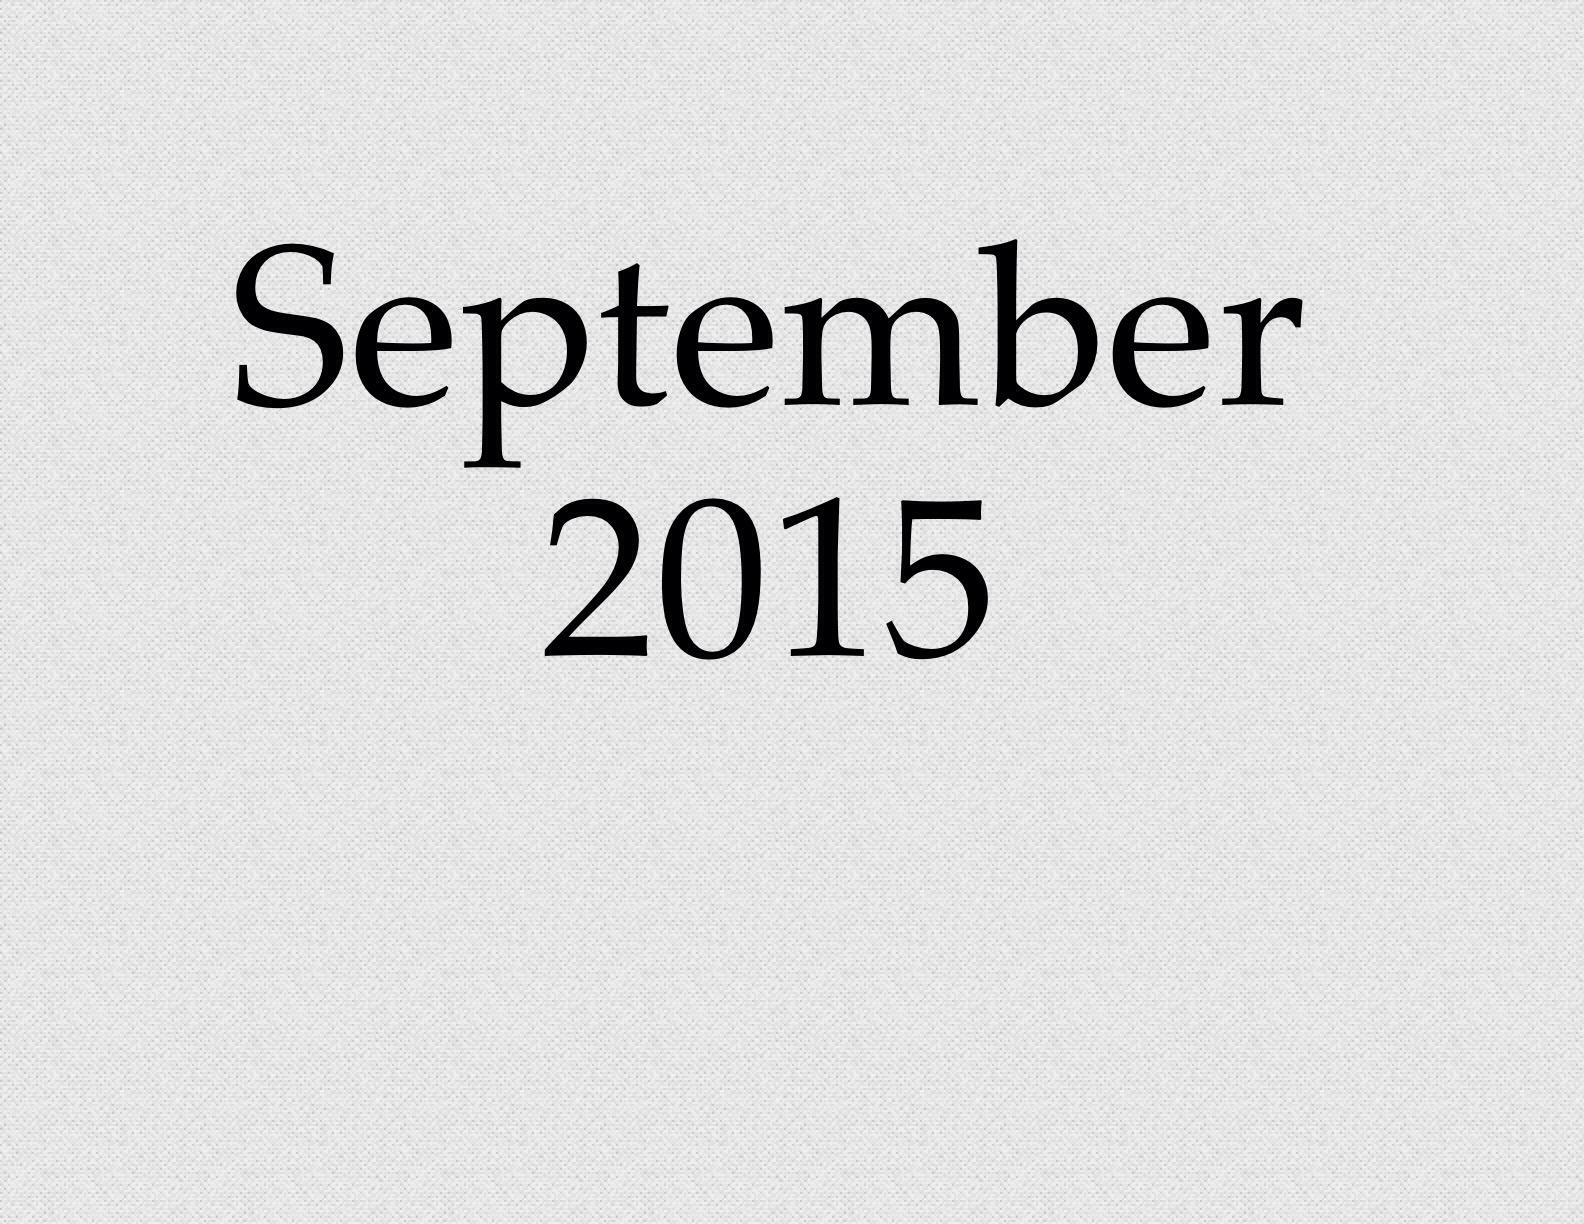 Photo Sep 04, 12 45 21 PM.jpg